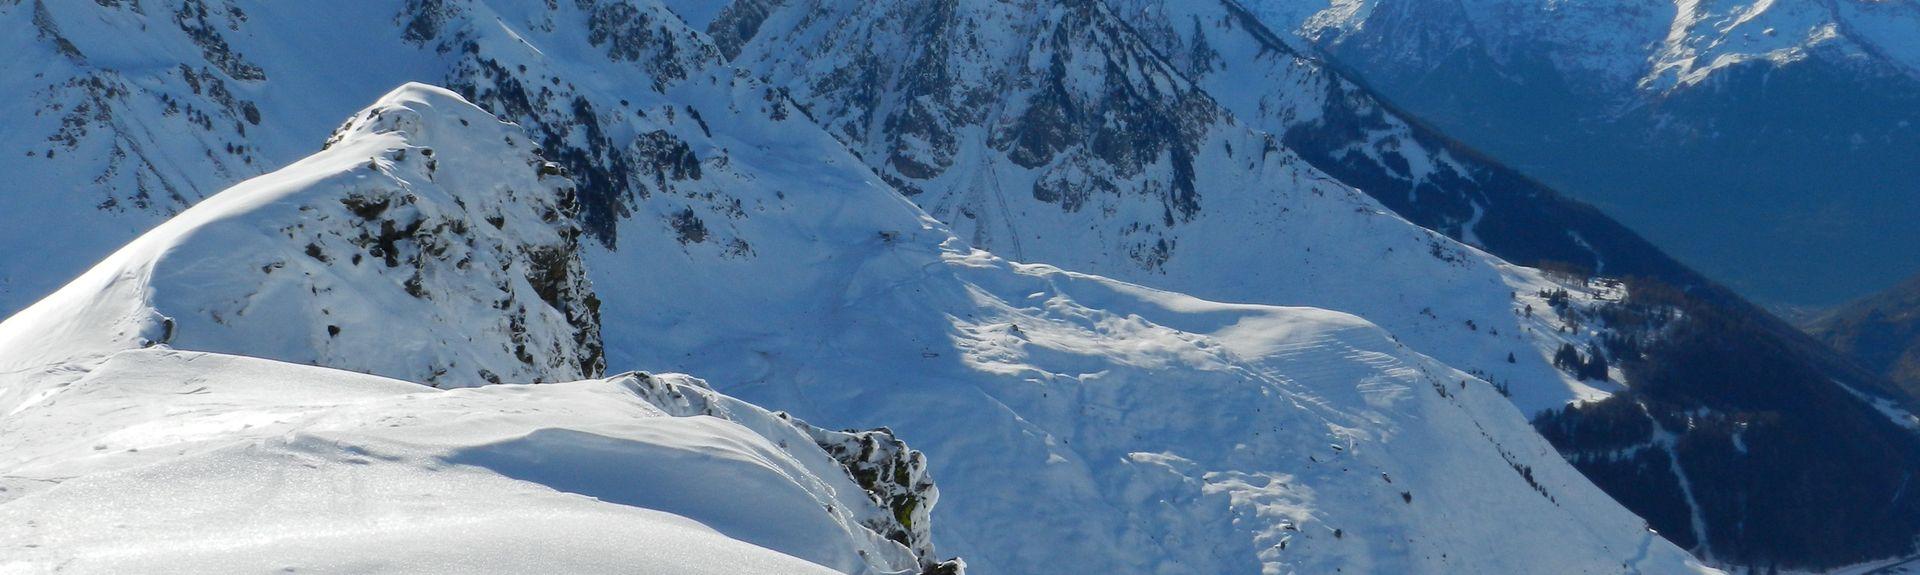 Prechac, Hautes-Pyrenees, France